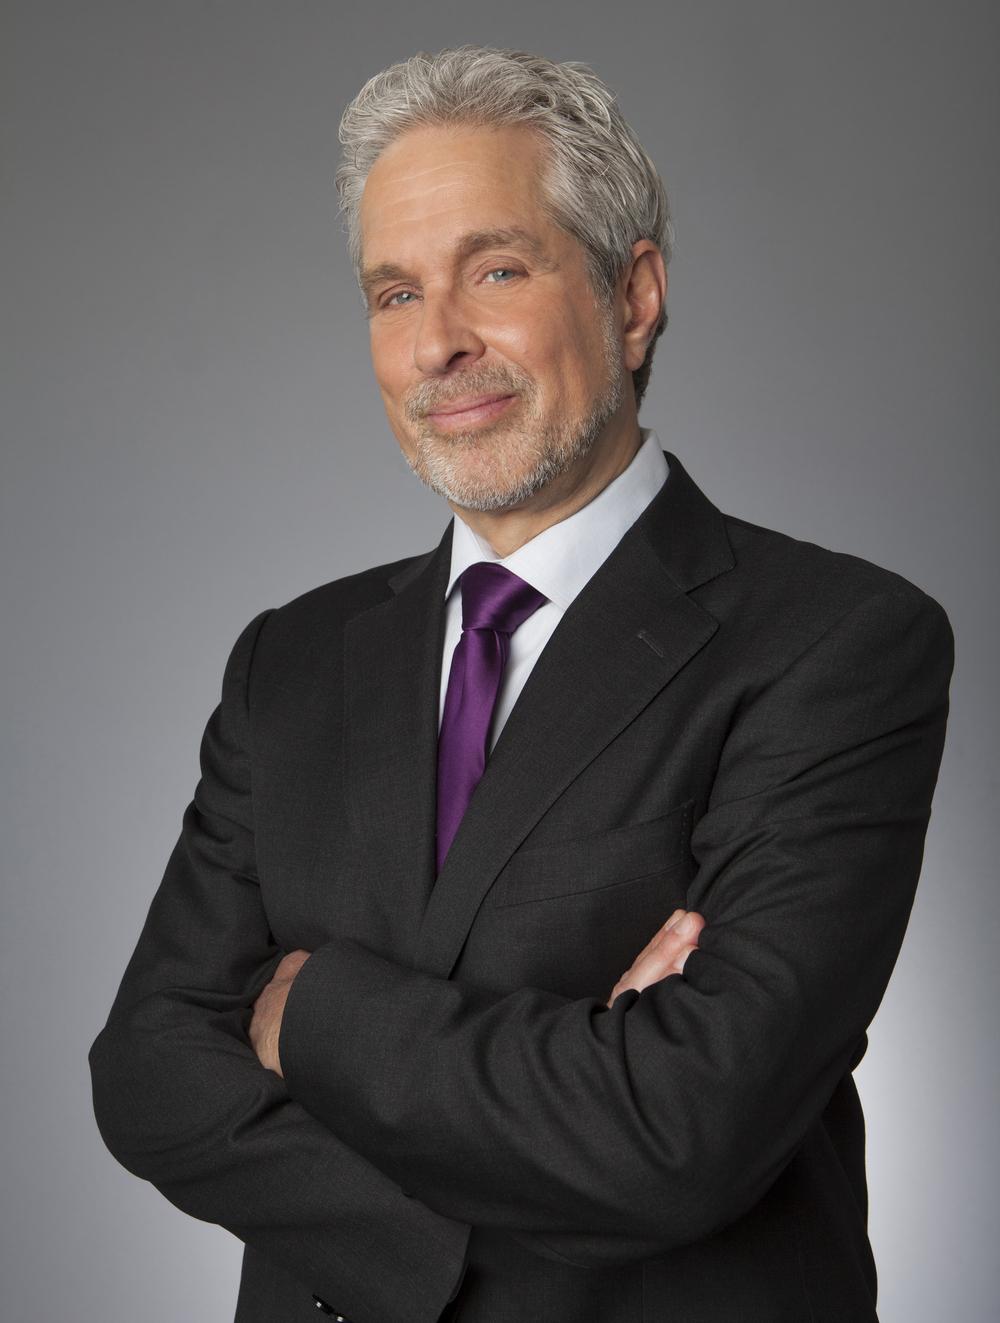 Managing Partner, Marc I. Gross